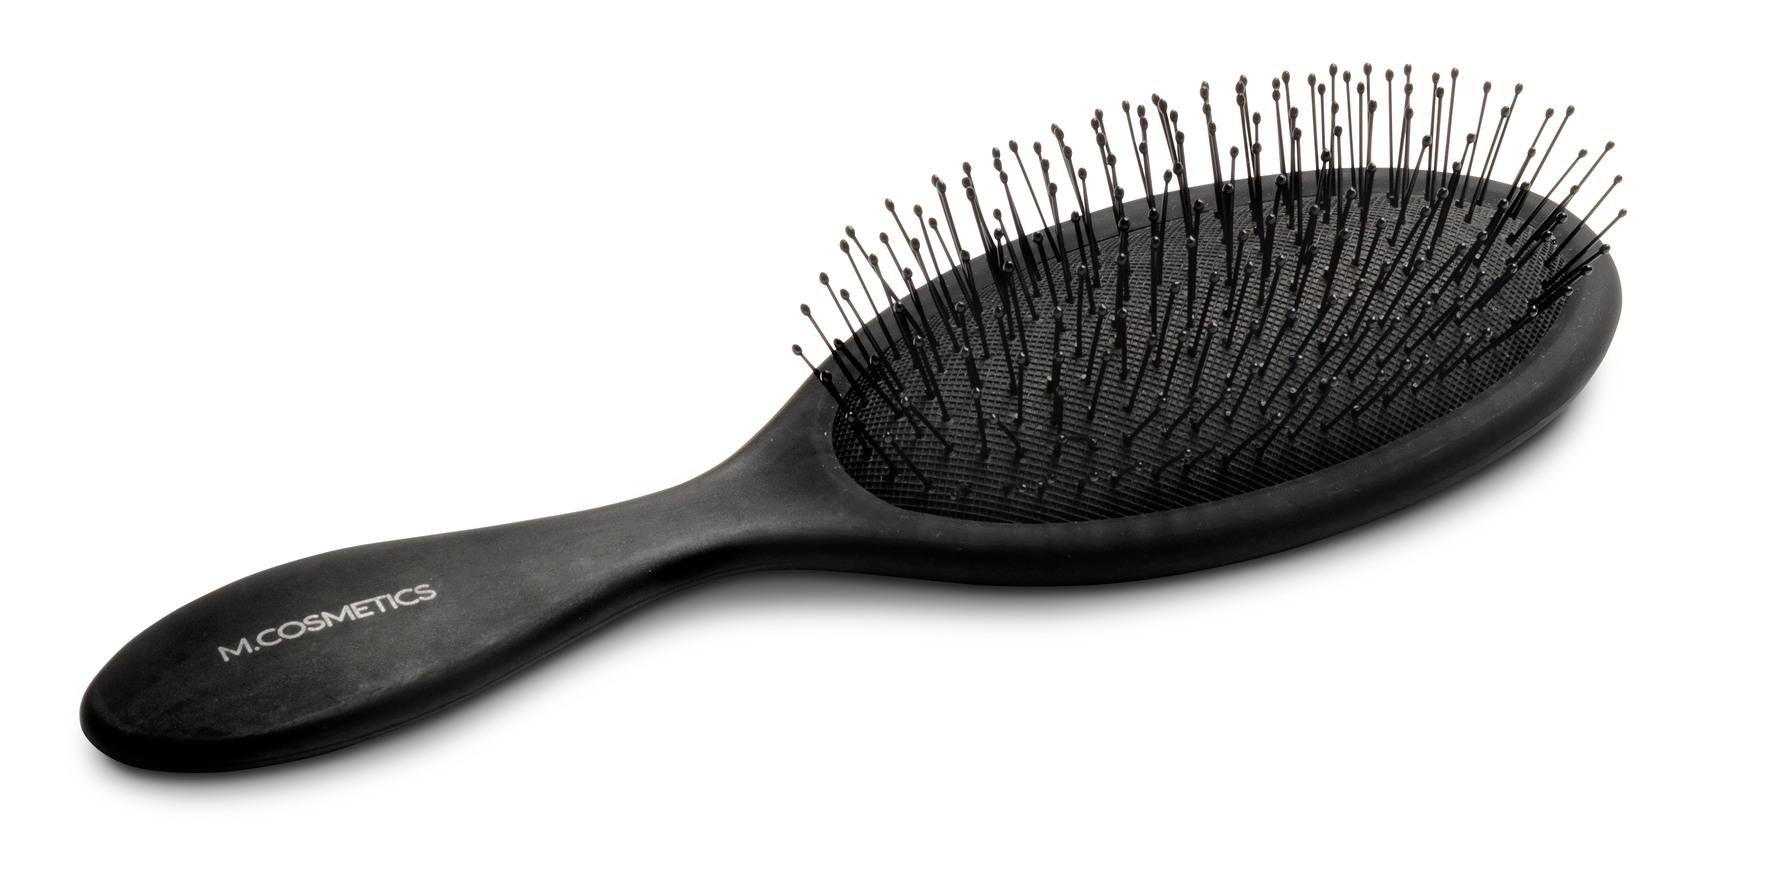 hårbørste føtex